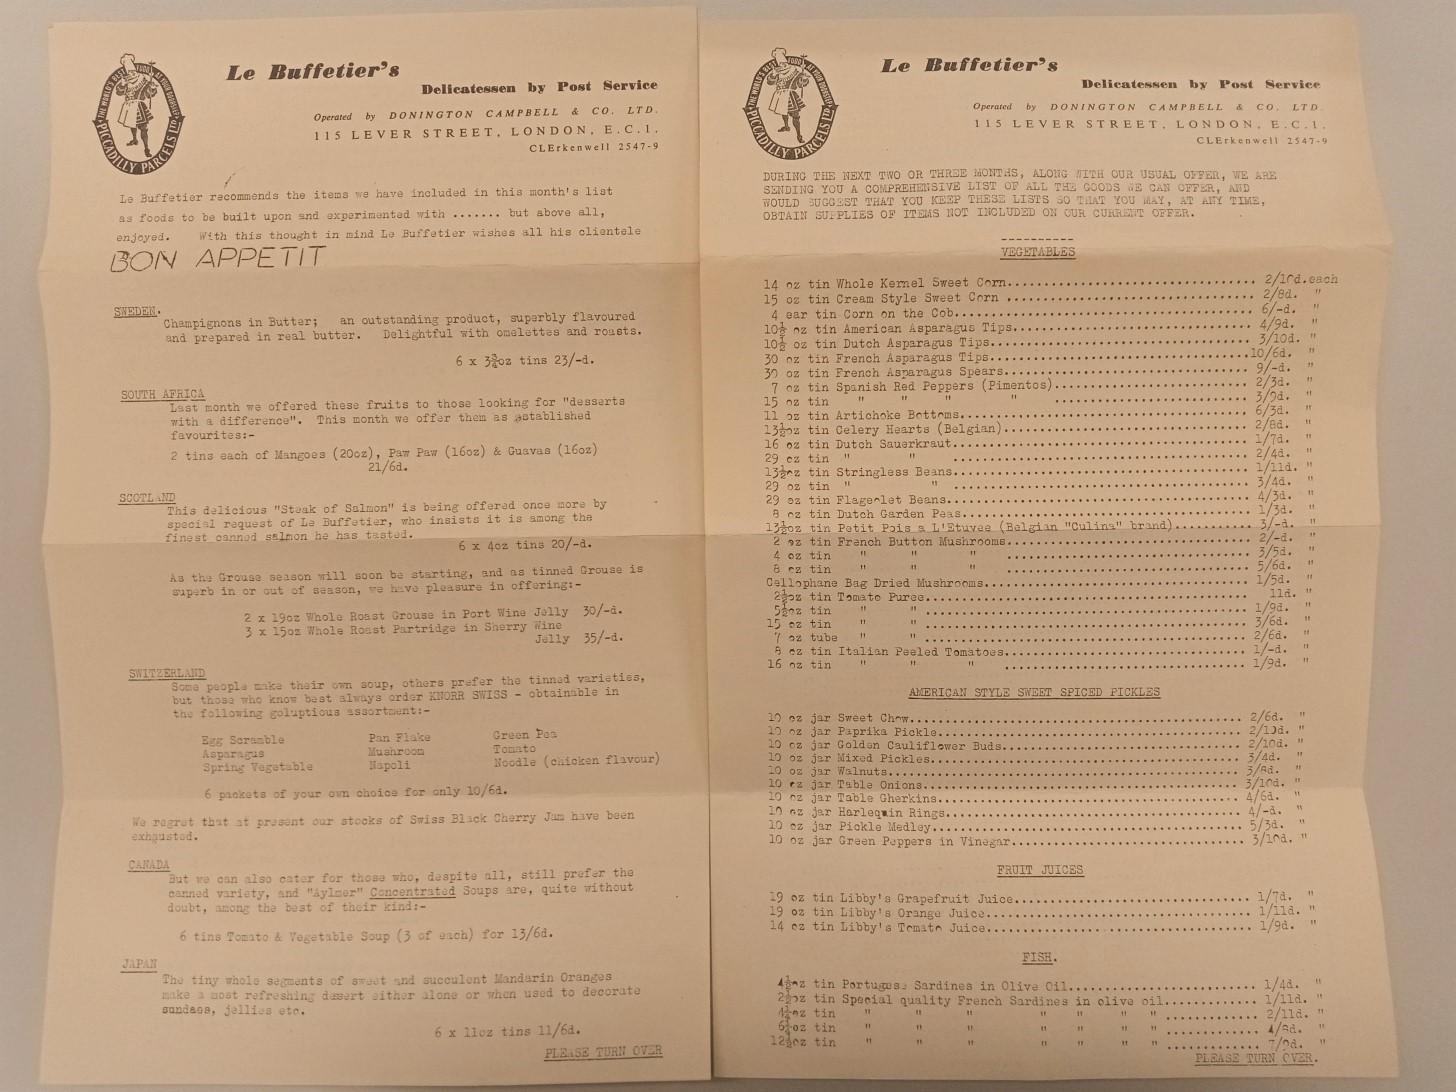 Typescript catalogue of Le Buffetier's Delicatessan, London, Sep 1954